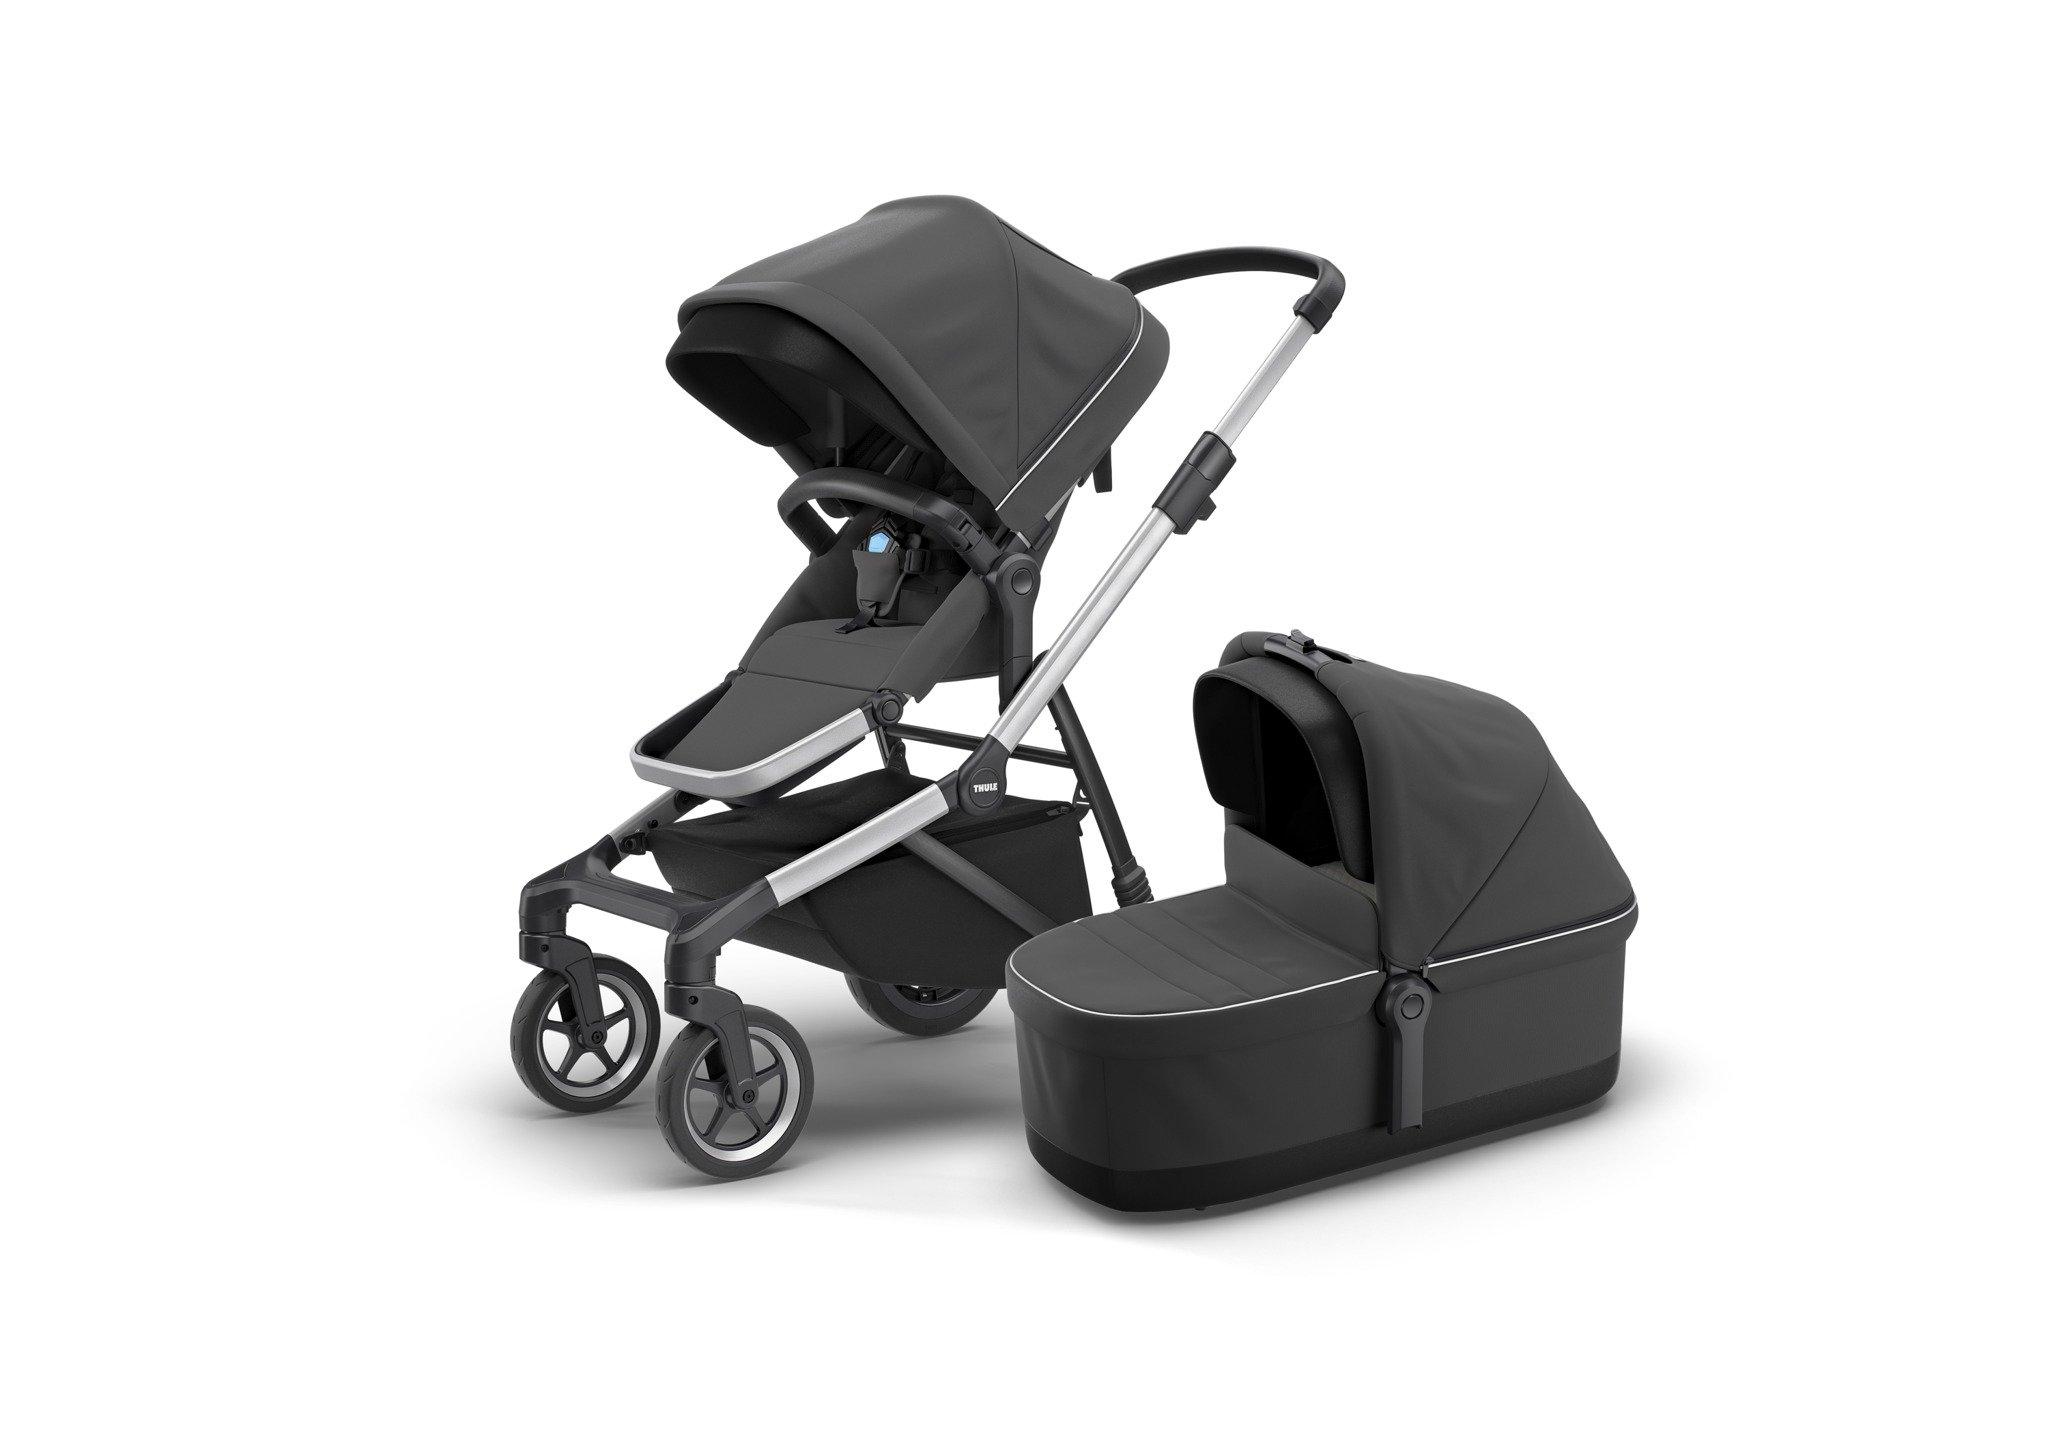 Thule Sleek - zestaw siedzisko spacerowe + gondola - Shadow Grey